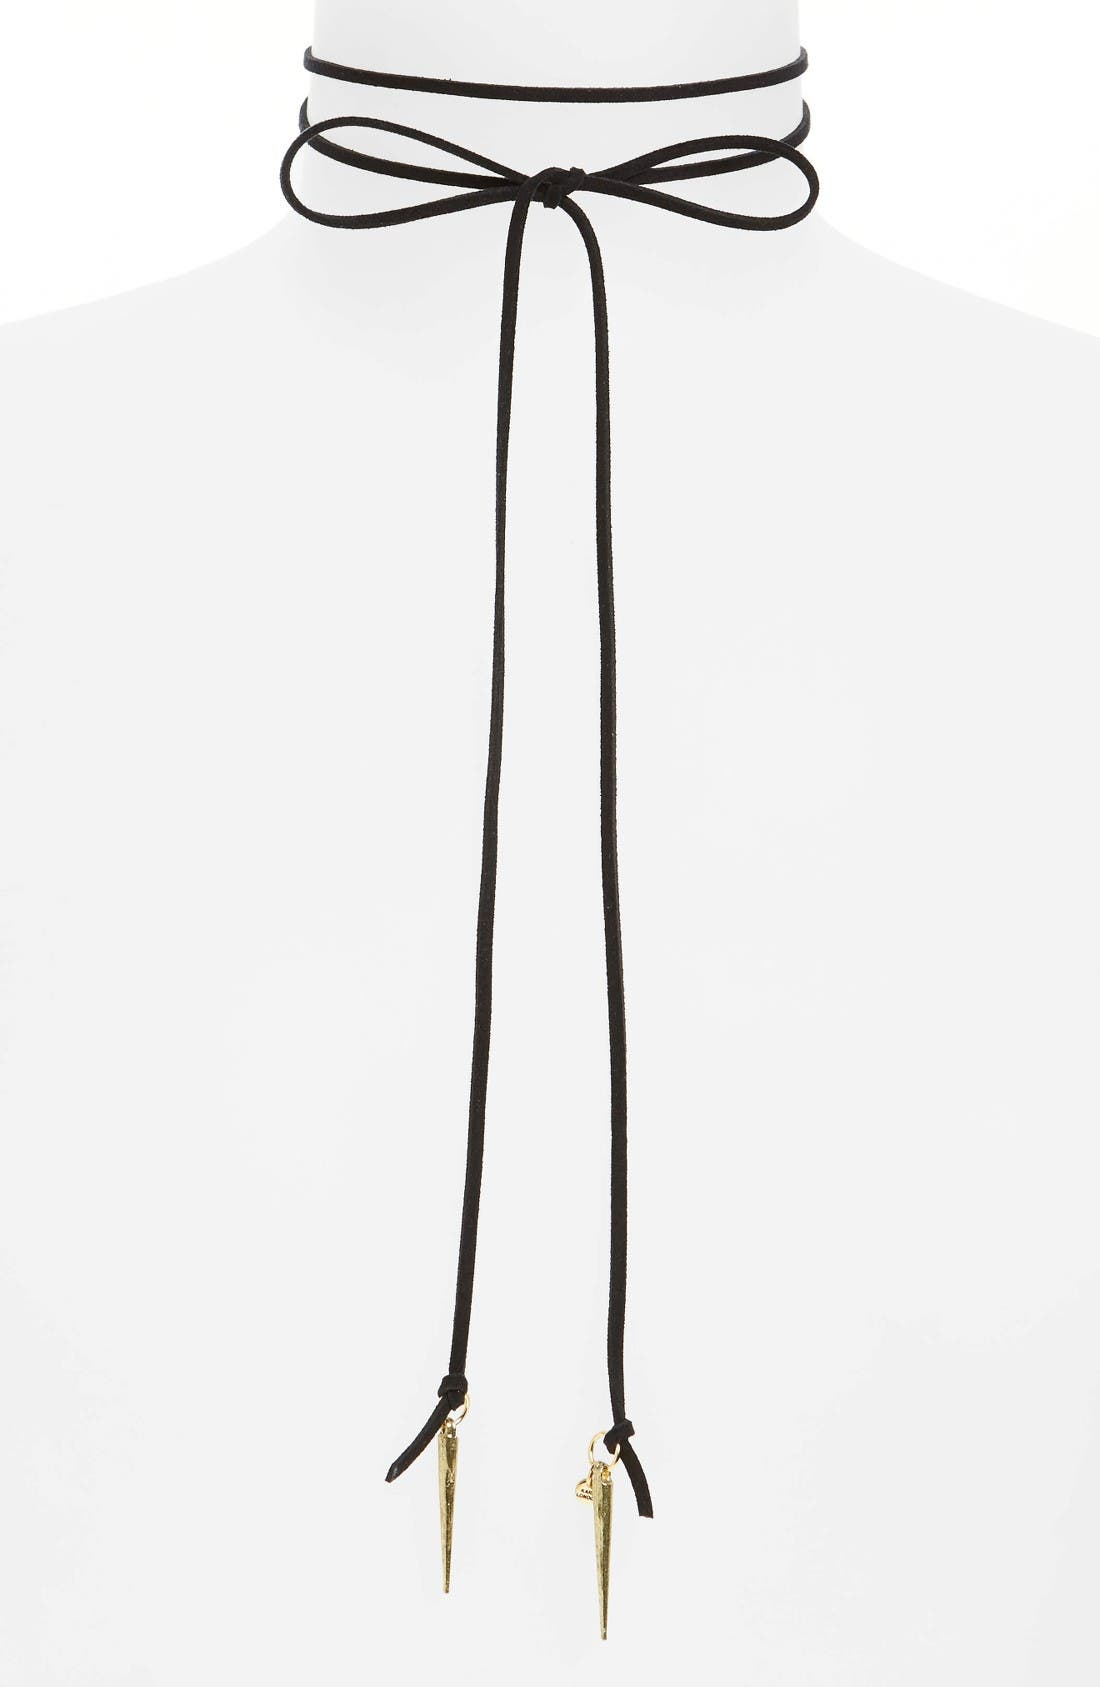 Alternate Image 1 Selected - Karen London Orbit Wraparound Necklace